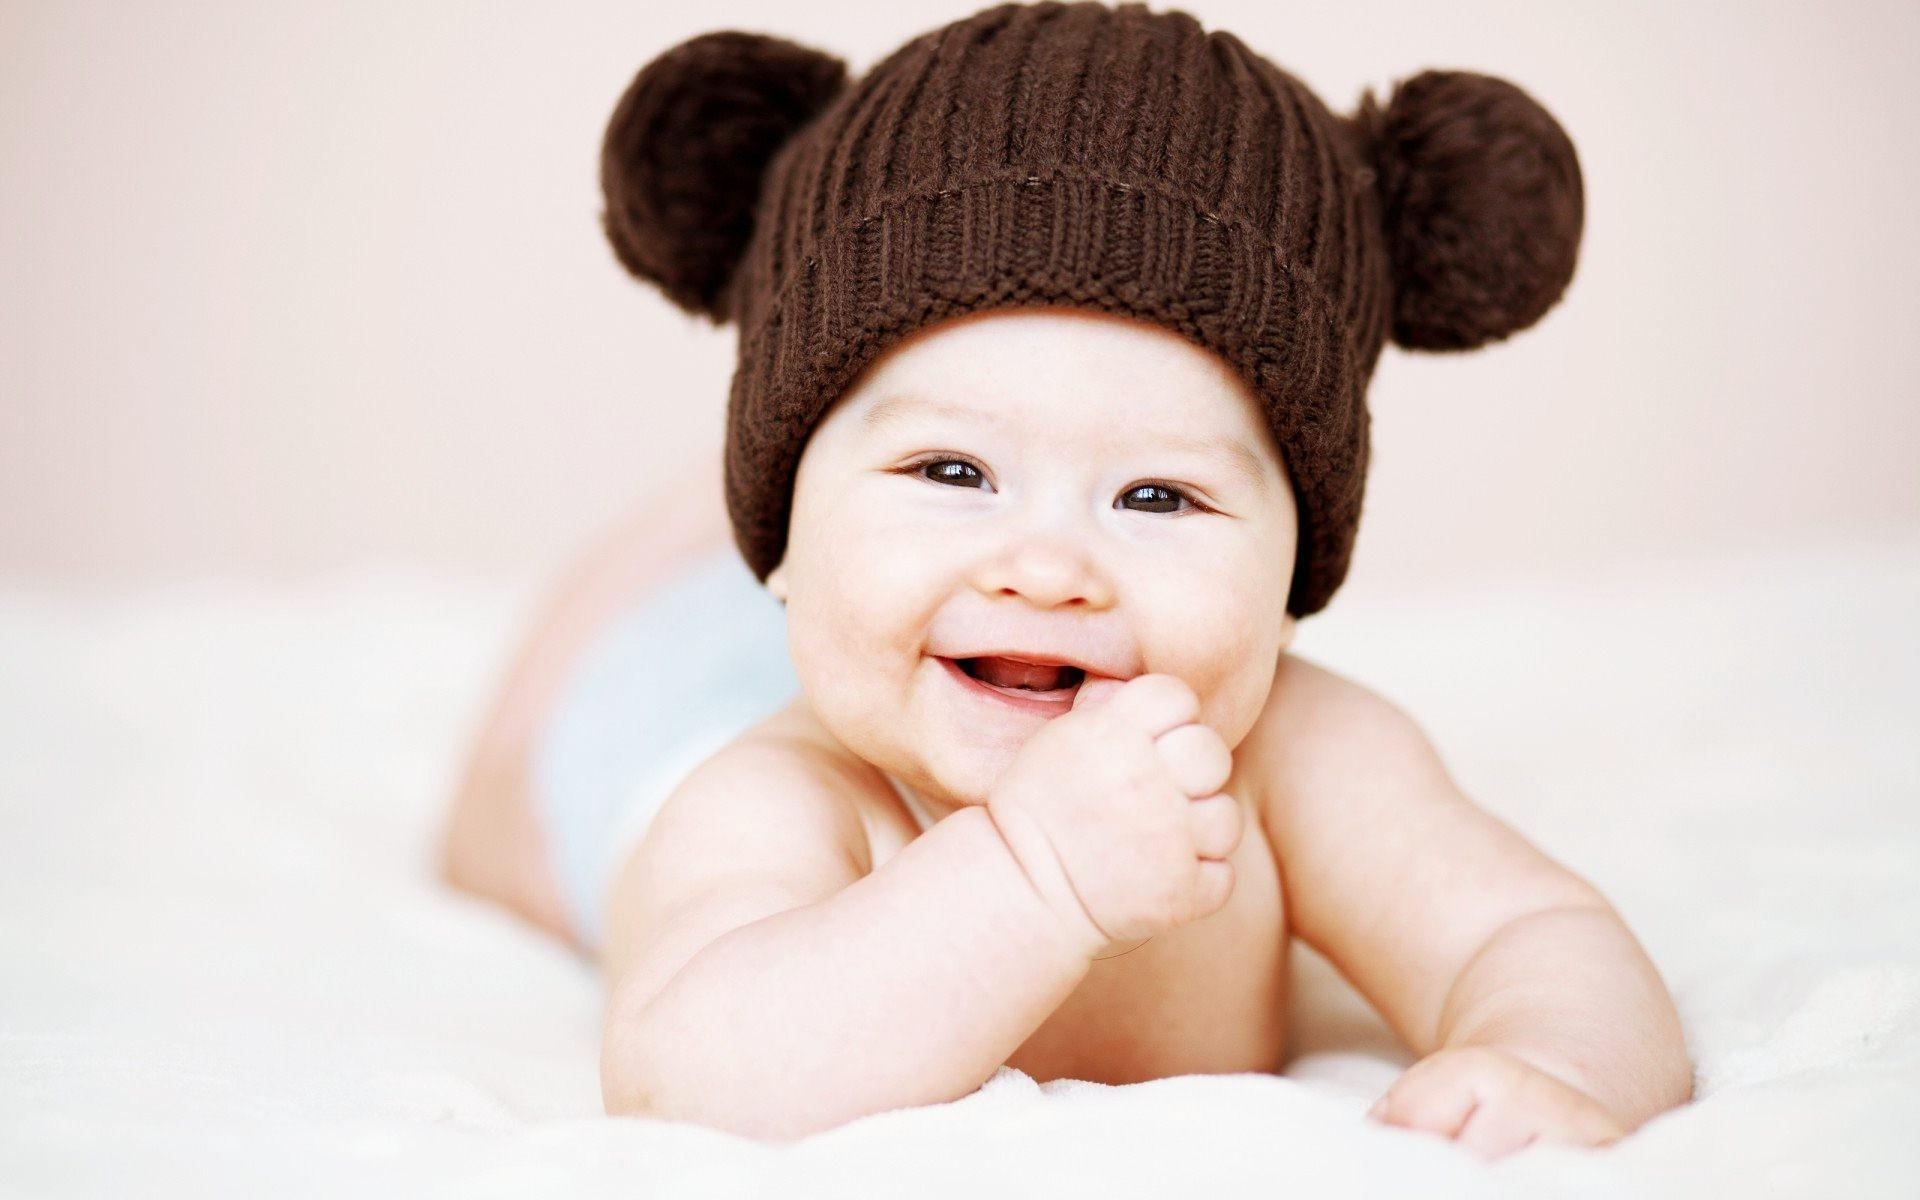 Smiling Cute Babies Wallpaper (62+ Images